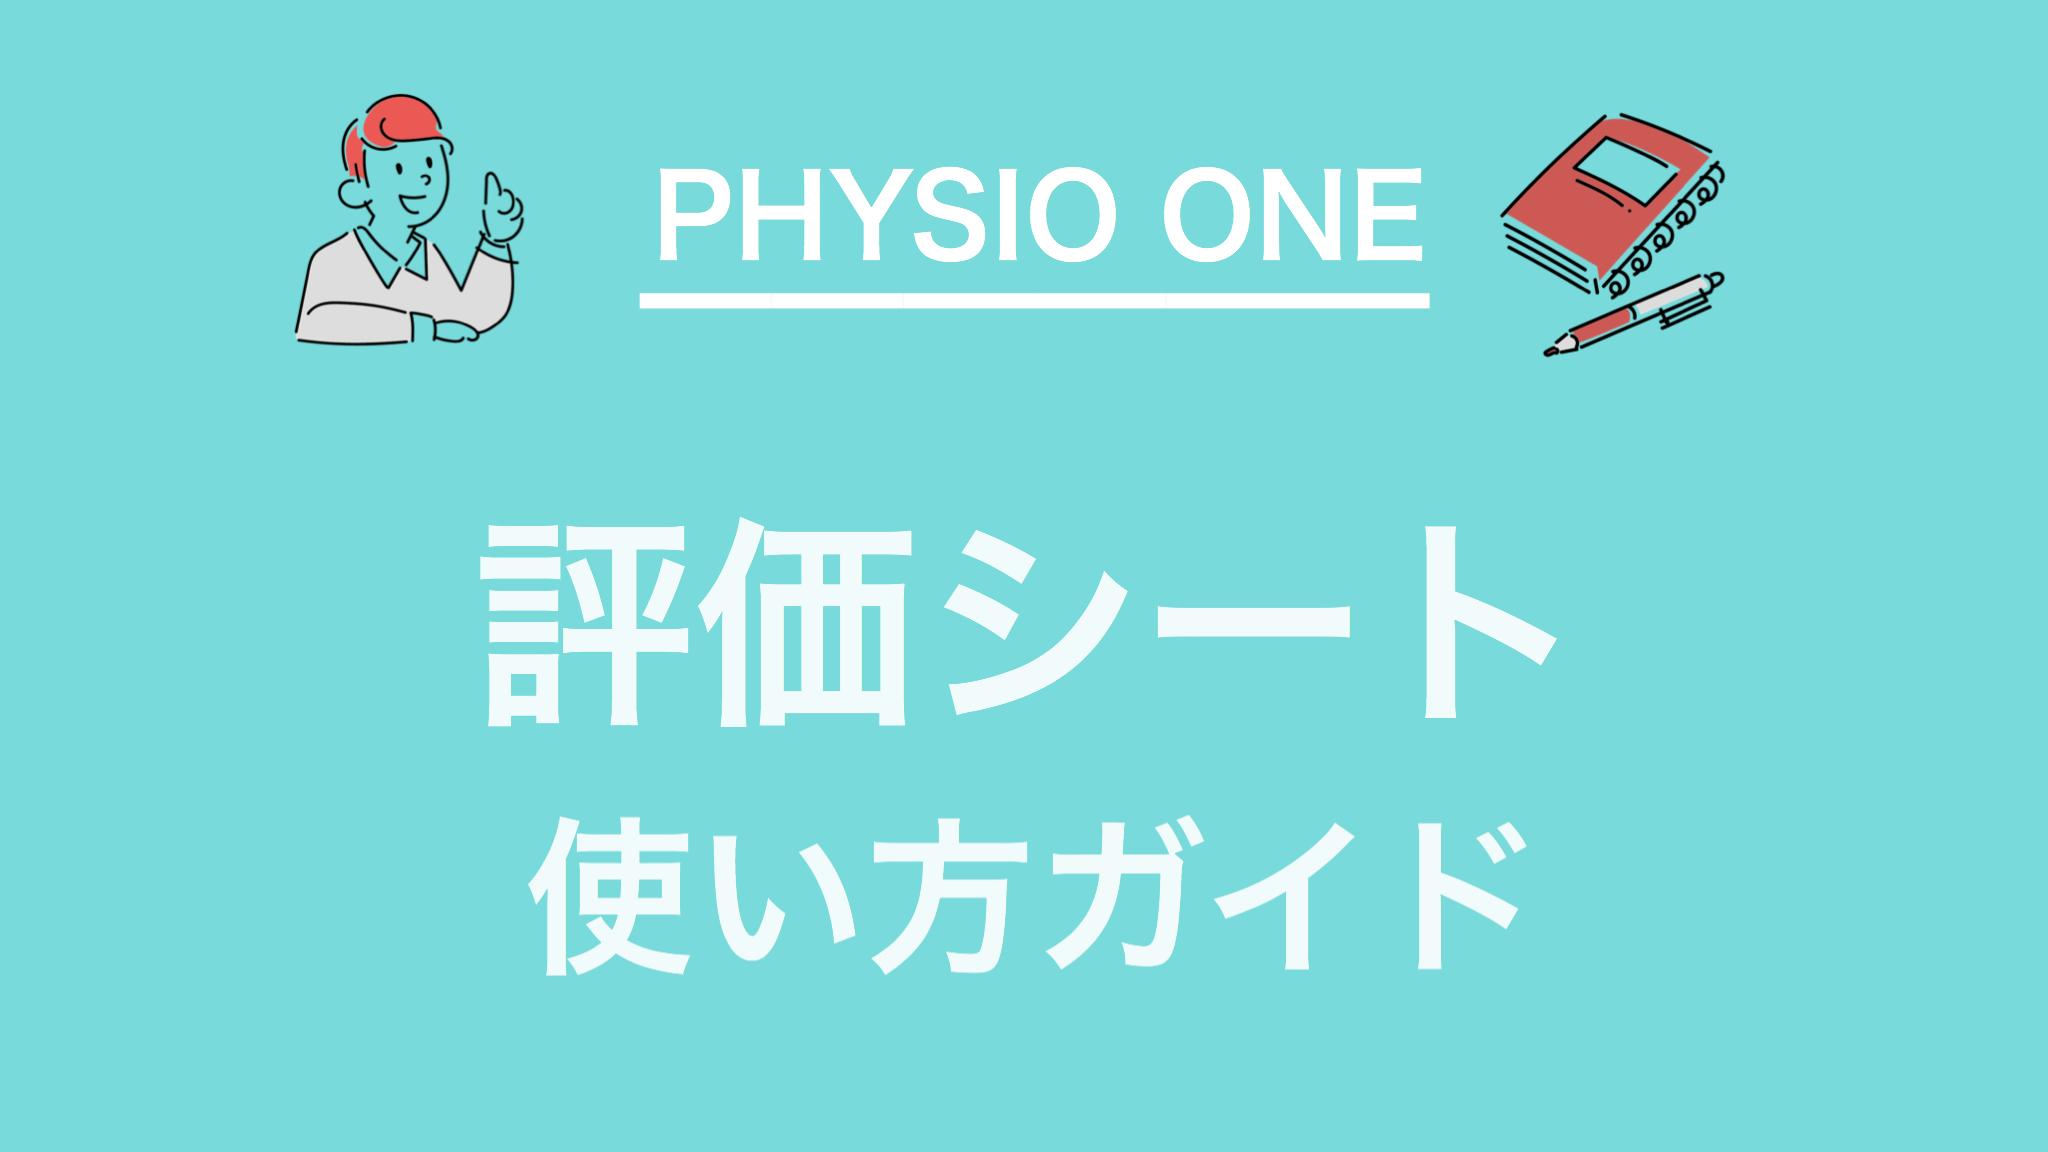 PHYSIO one